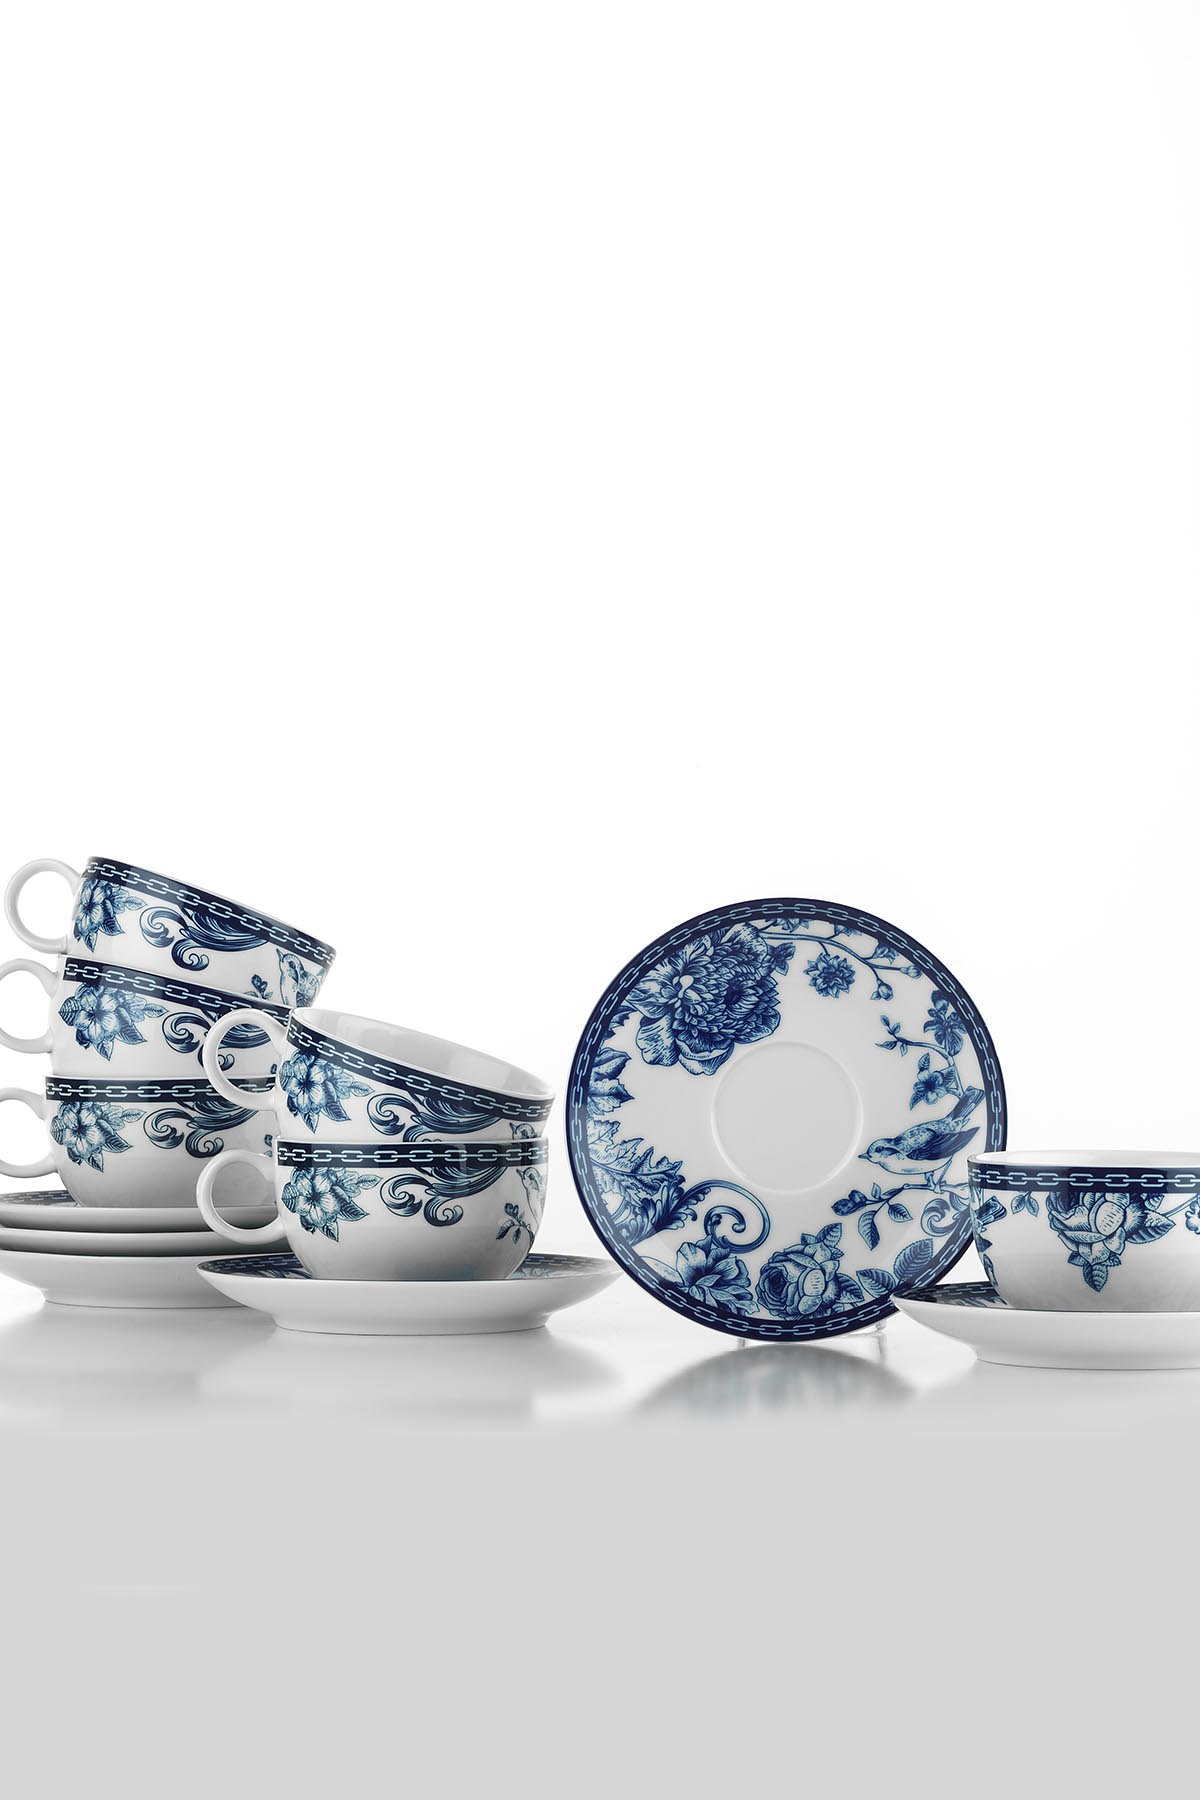 Kütahya Porselen Bleu Blanc Çay Fincan Takımı 939016